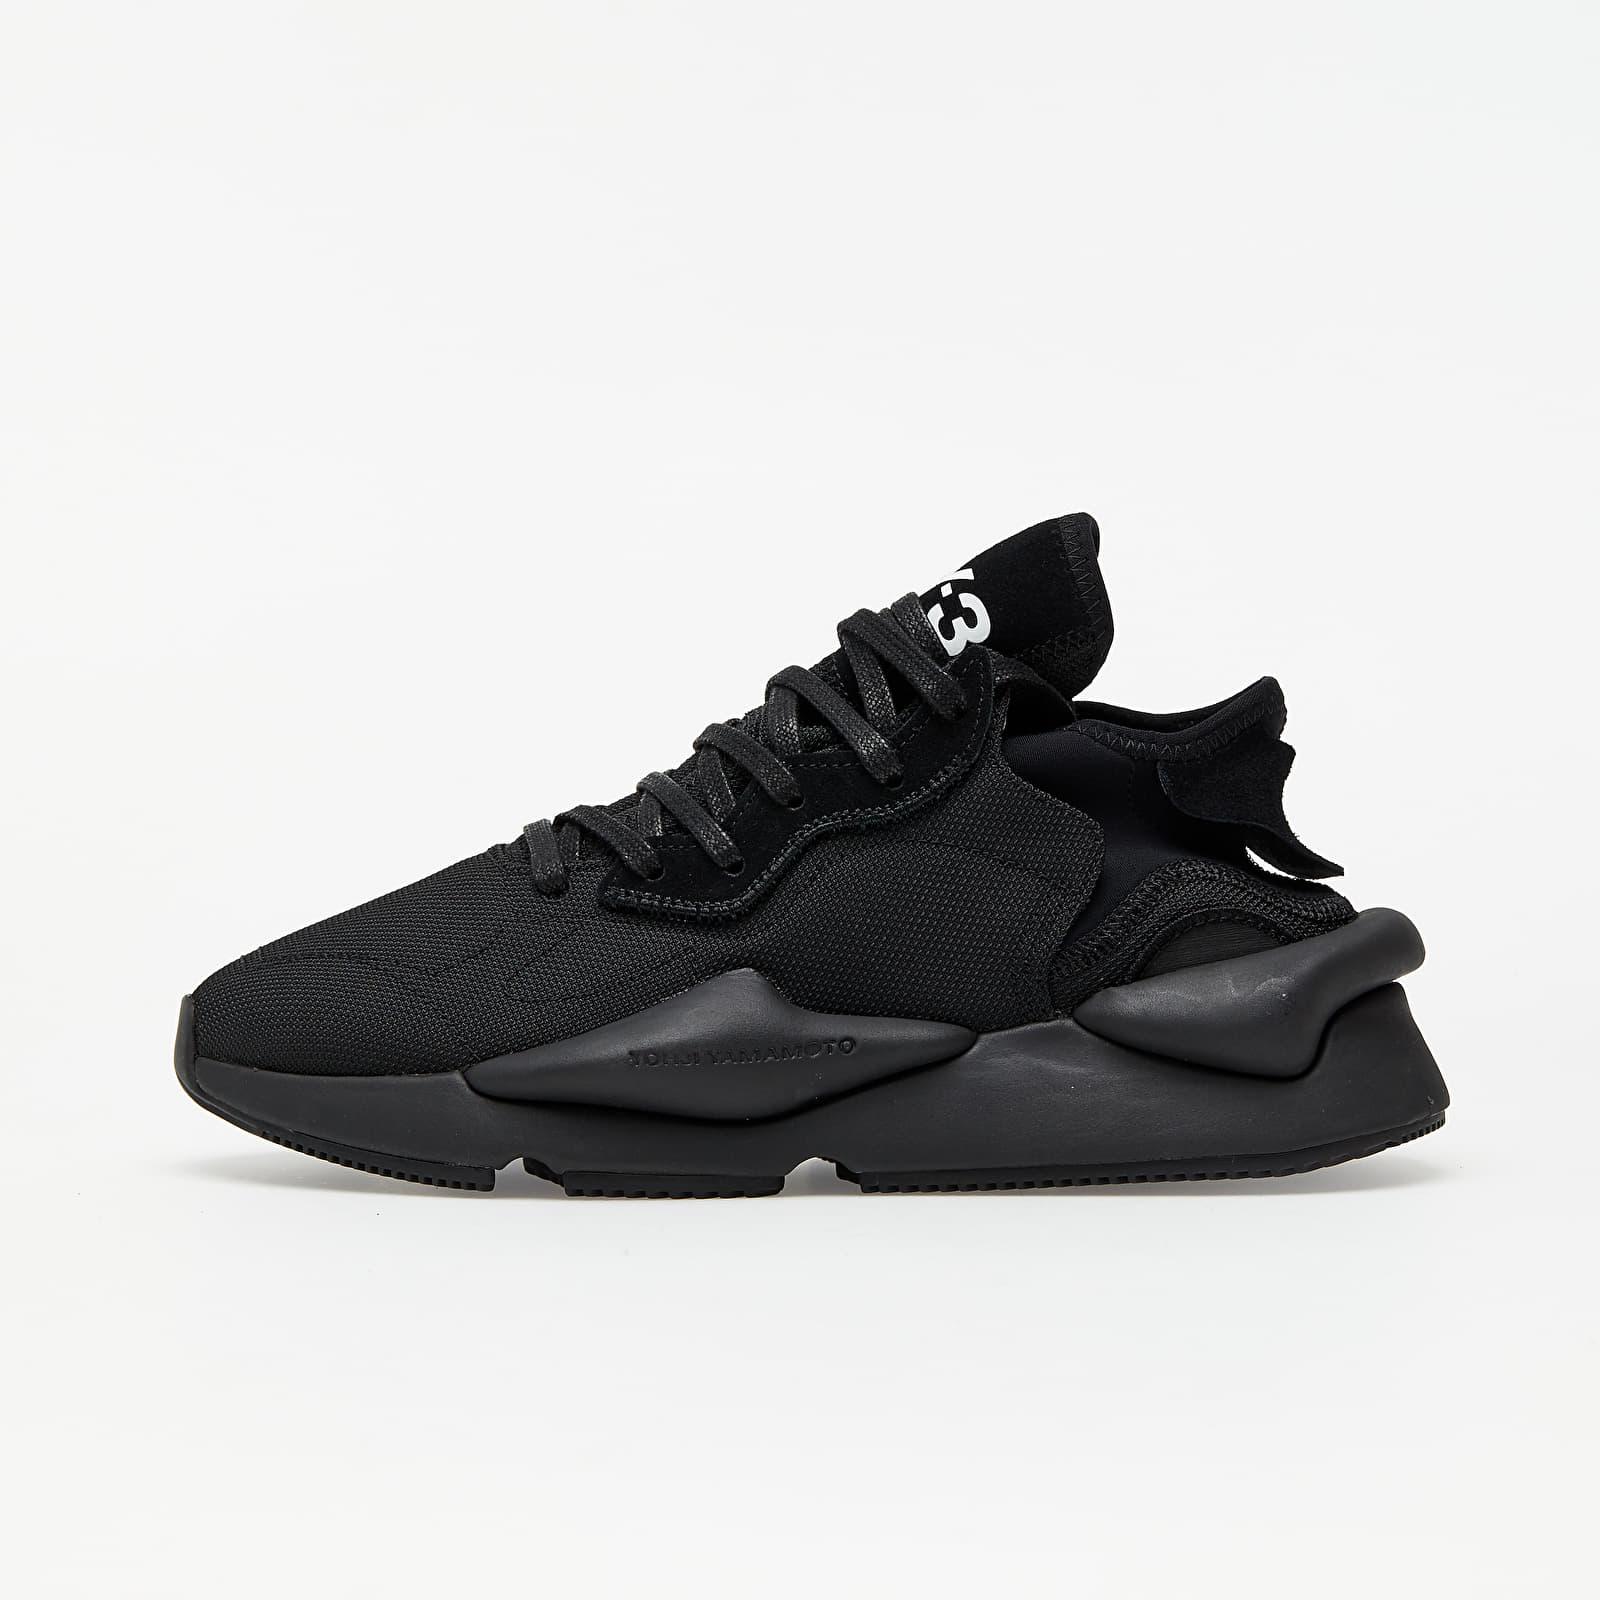 Men's shoes Y-3 Kaiwa Core Black/ Core Black/ Ftwr White